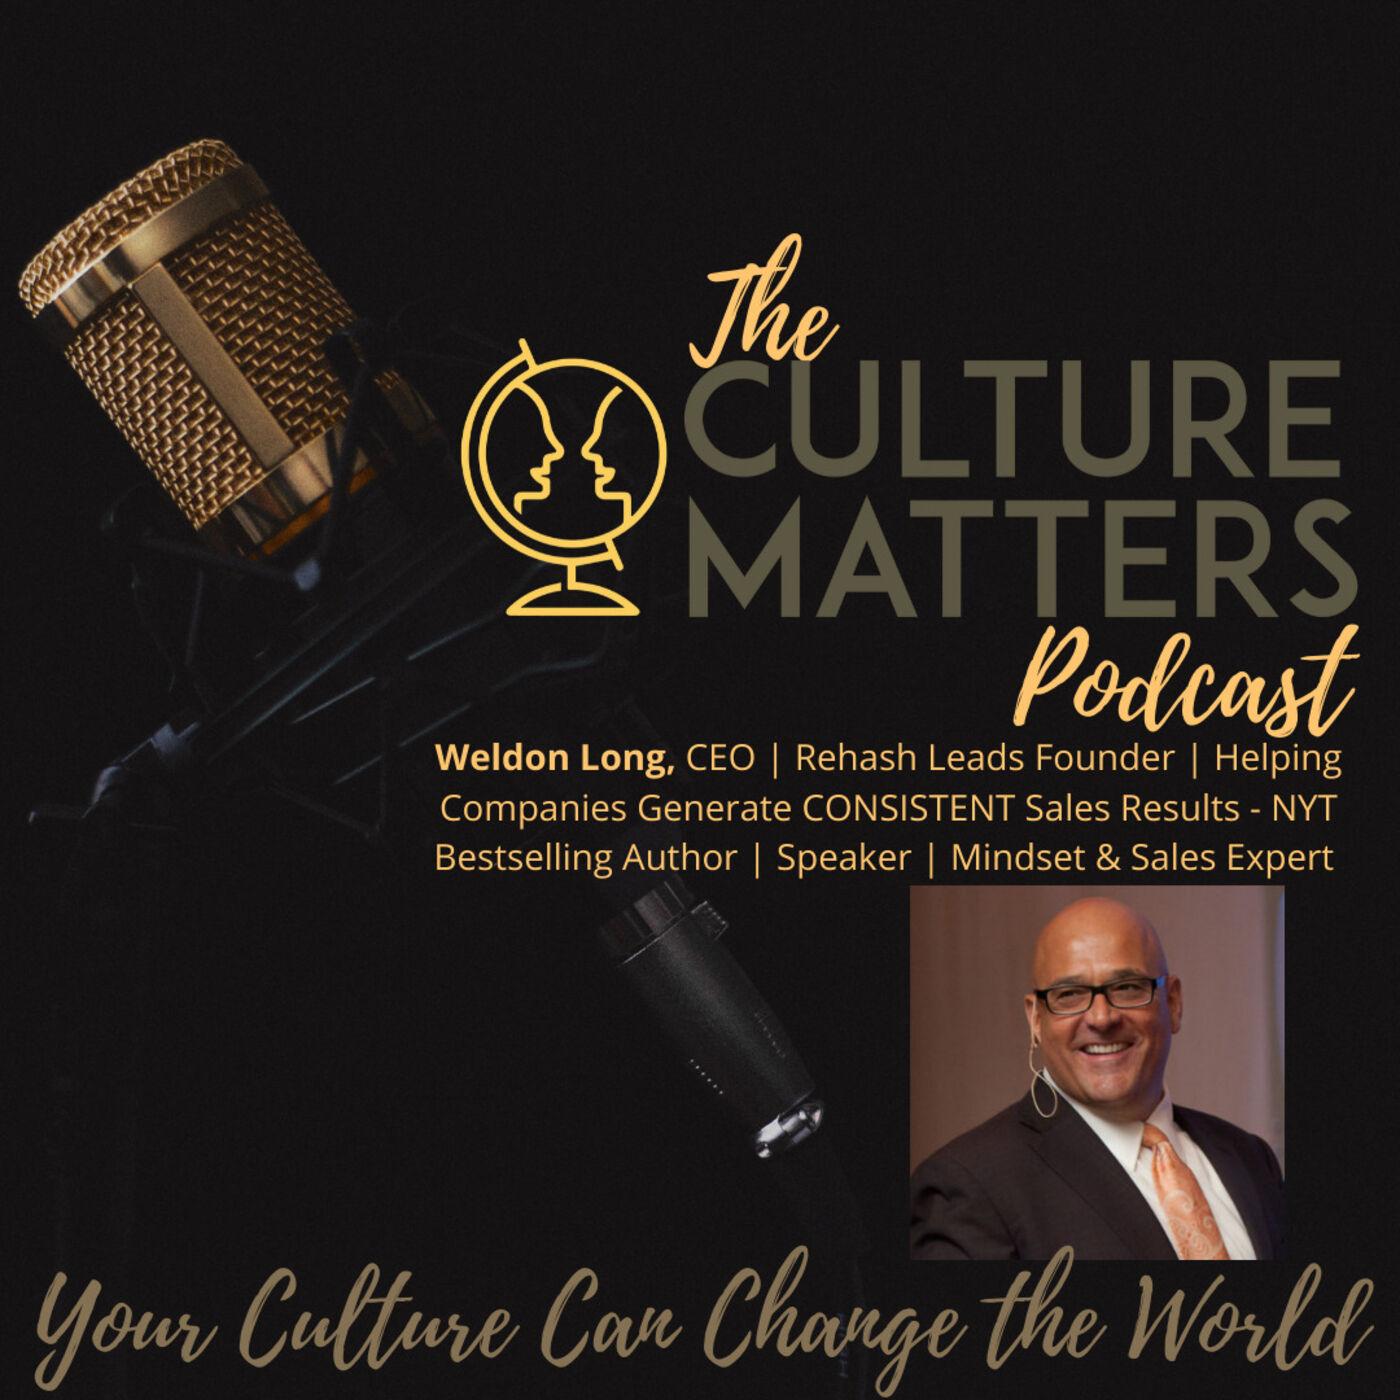 Season 7, Episode 77: Guest: Weldon Long: Improve Your Awareness